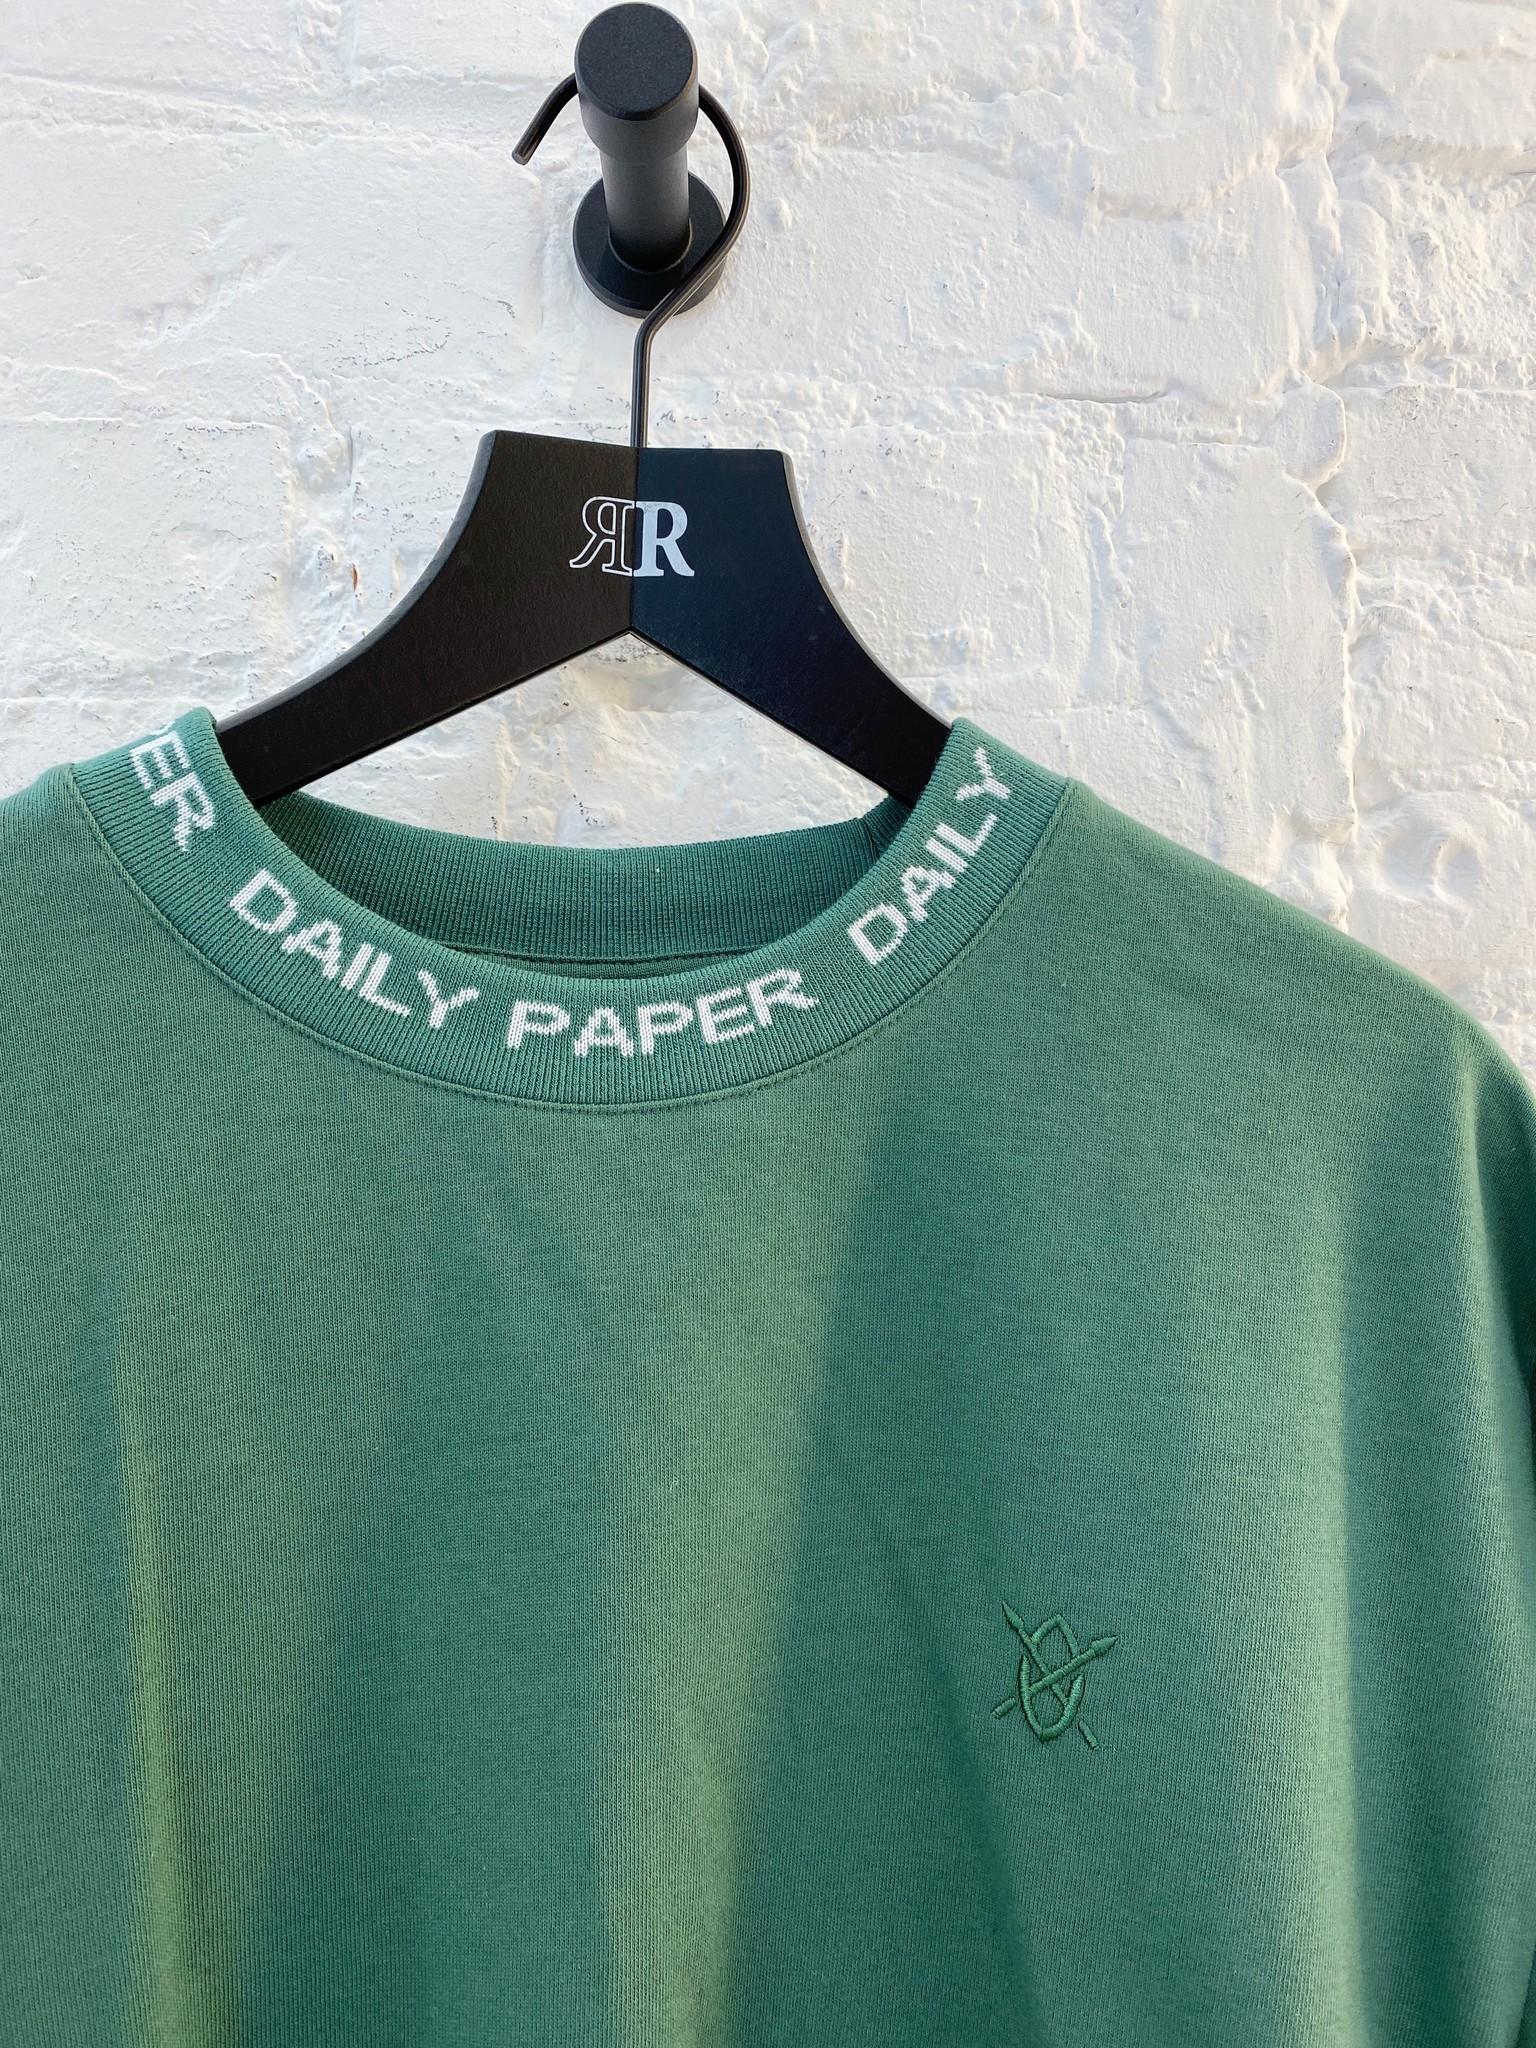 Derib T-shirt-3